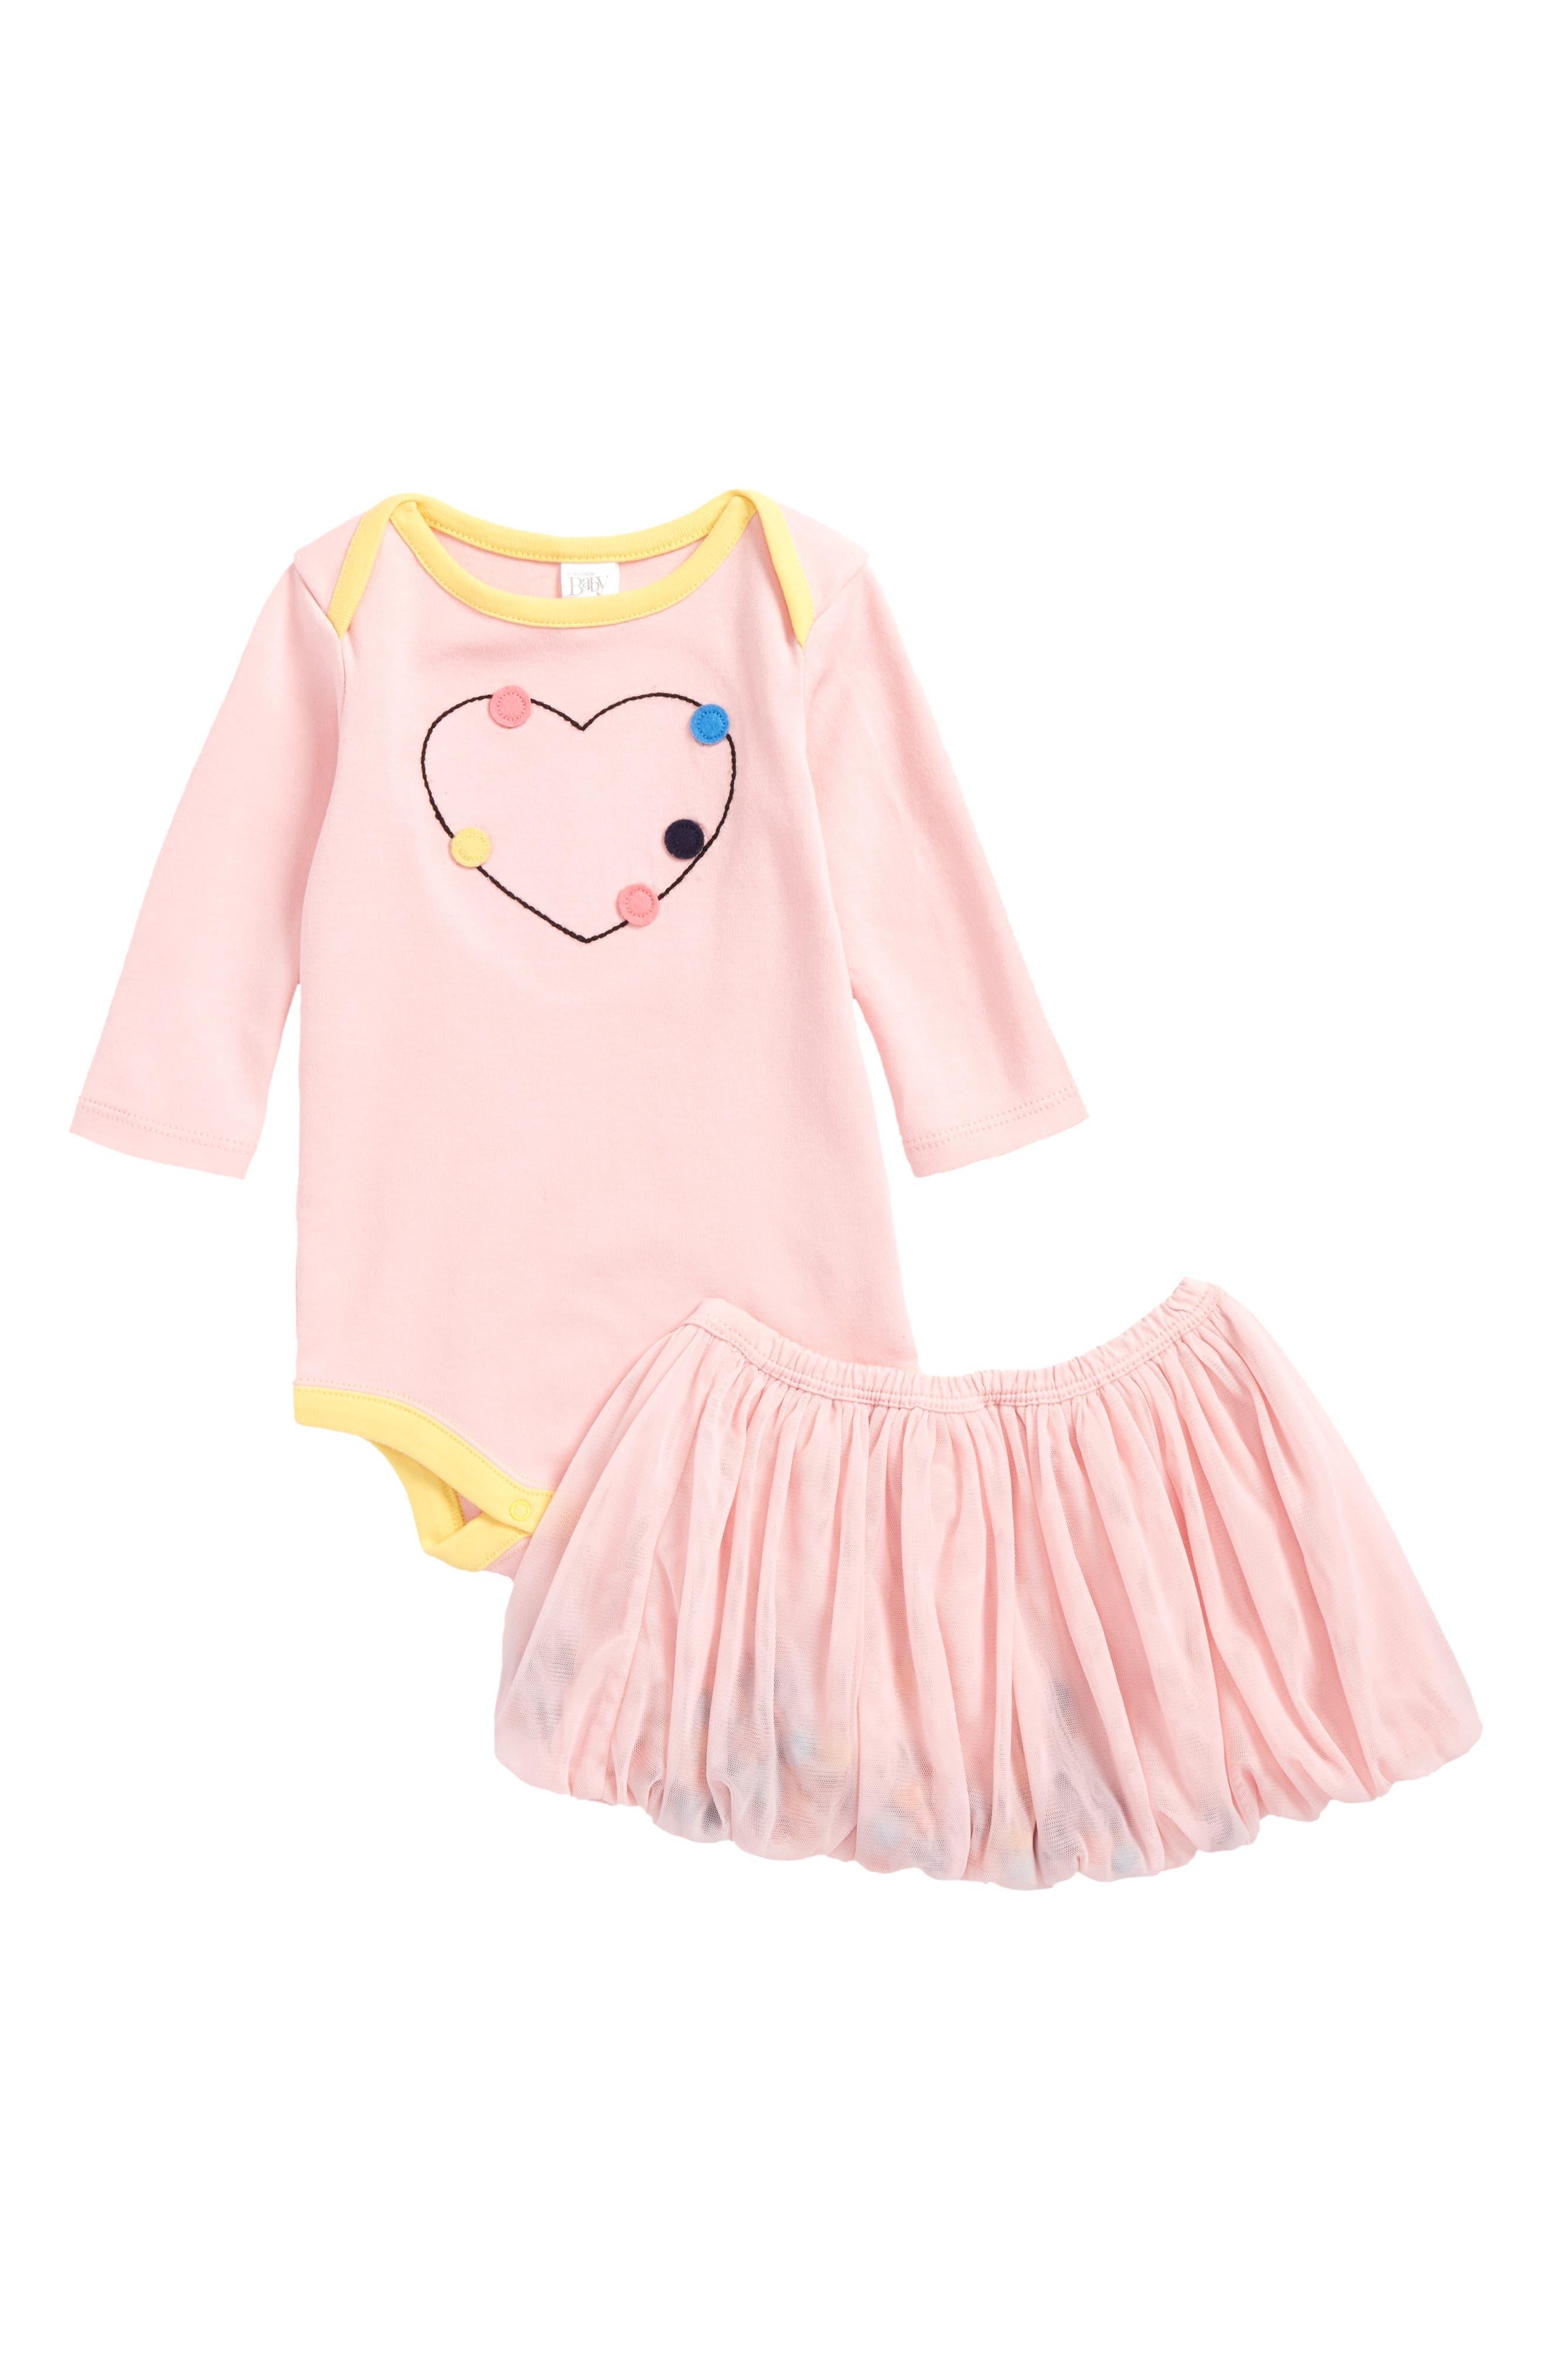 Bodysuit & Pompom Tutu Skirt Set,                             Main thumbnail 1, color,                             Pink Coral Hearts